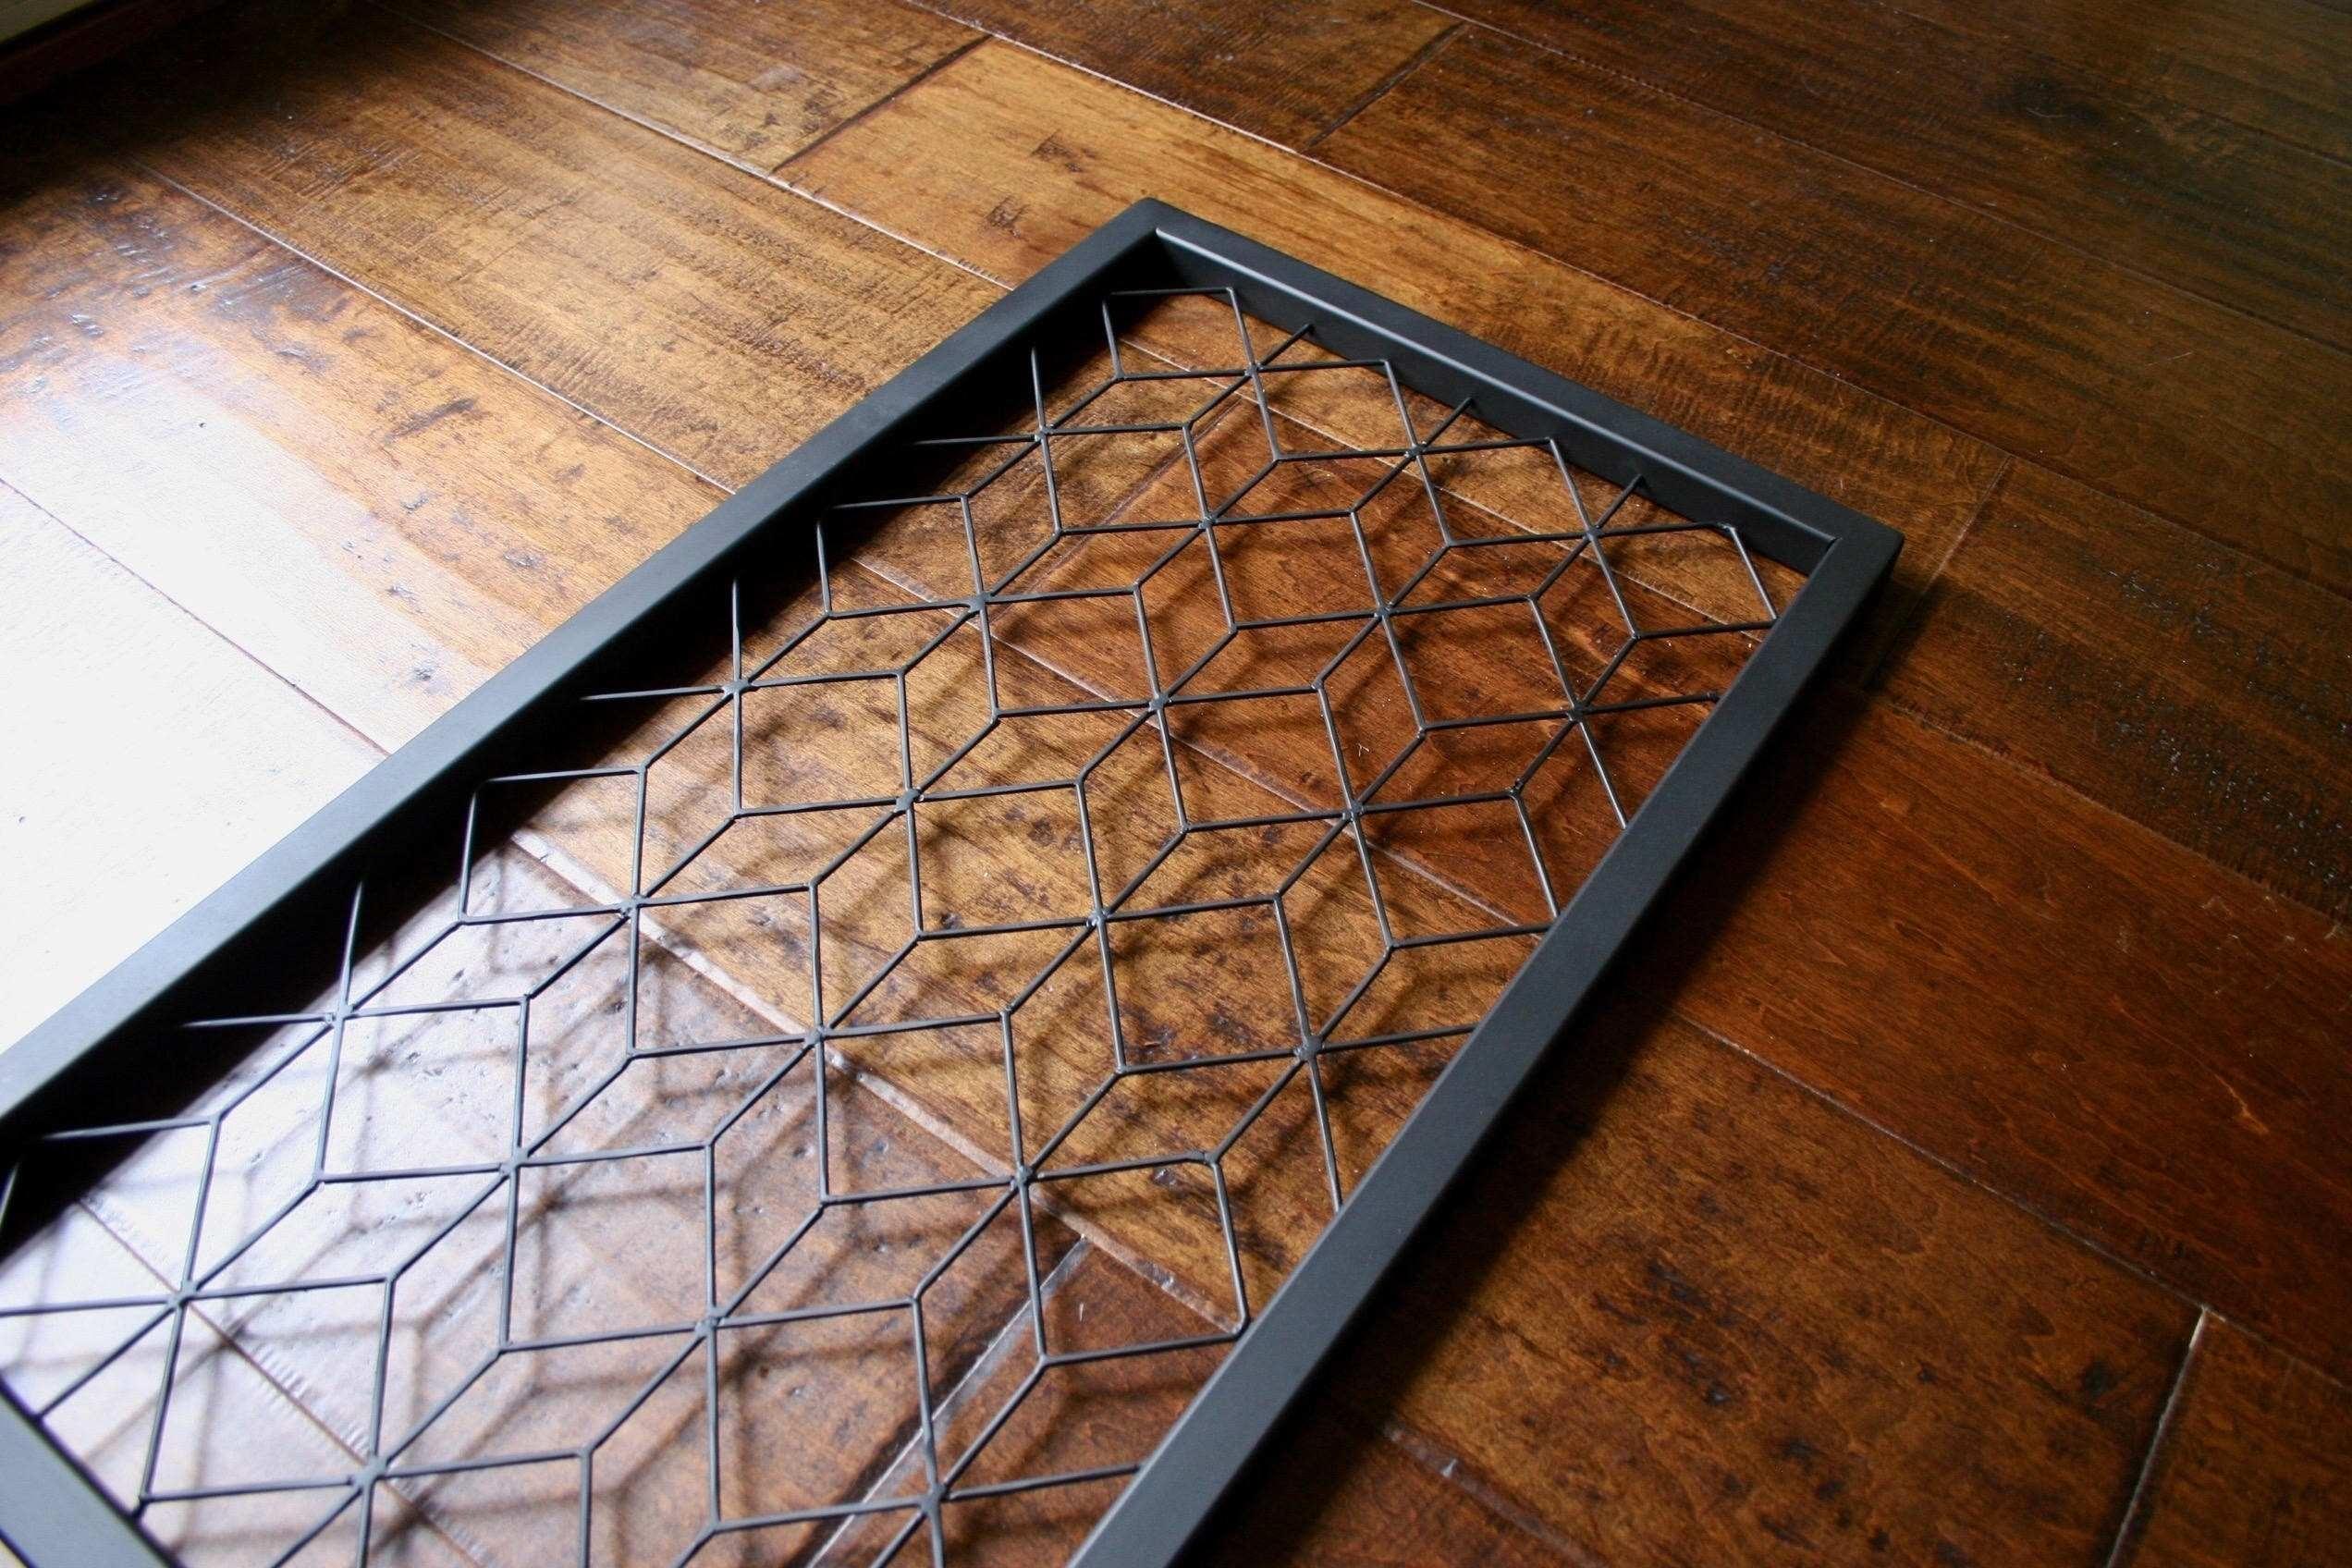 Geometric Wall Decor Awesome Metal Wall Art Panels Fresh 1 Kirkland With Geometric Metal Wall Art (View 15 of 20)